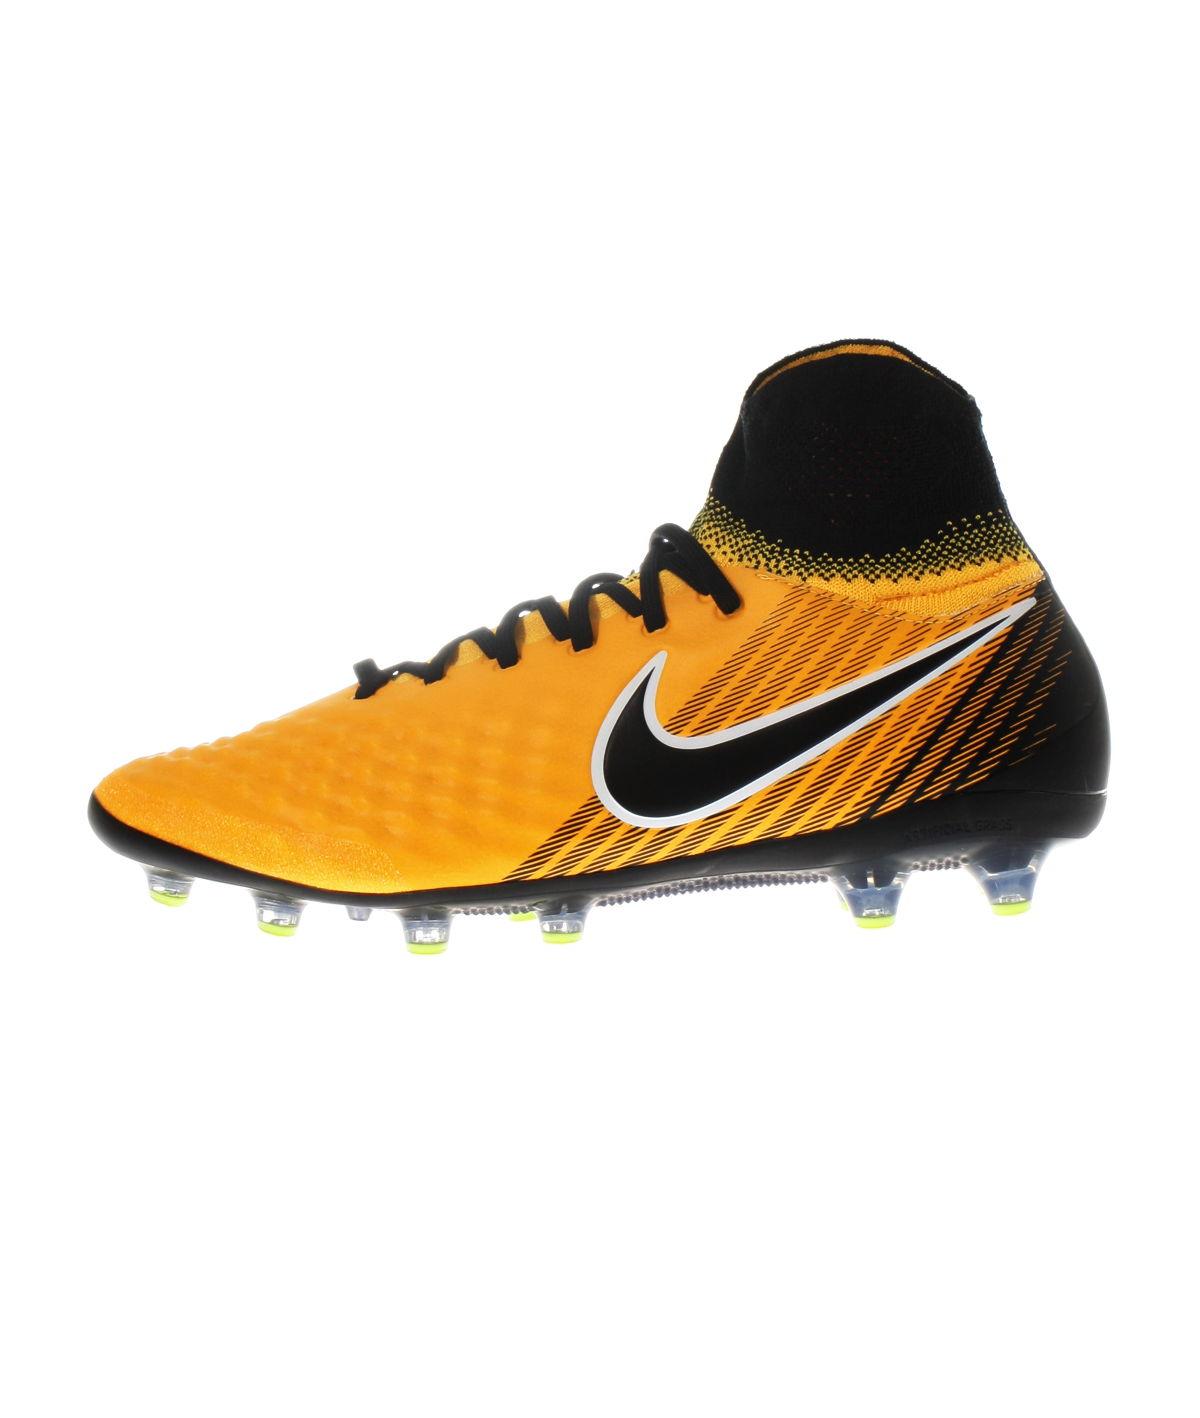 best website 8b54d a6505 Nike Herren Fußballschuhe Magista Orden III AG-Pro 843811 801 | eBay